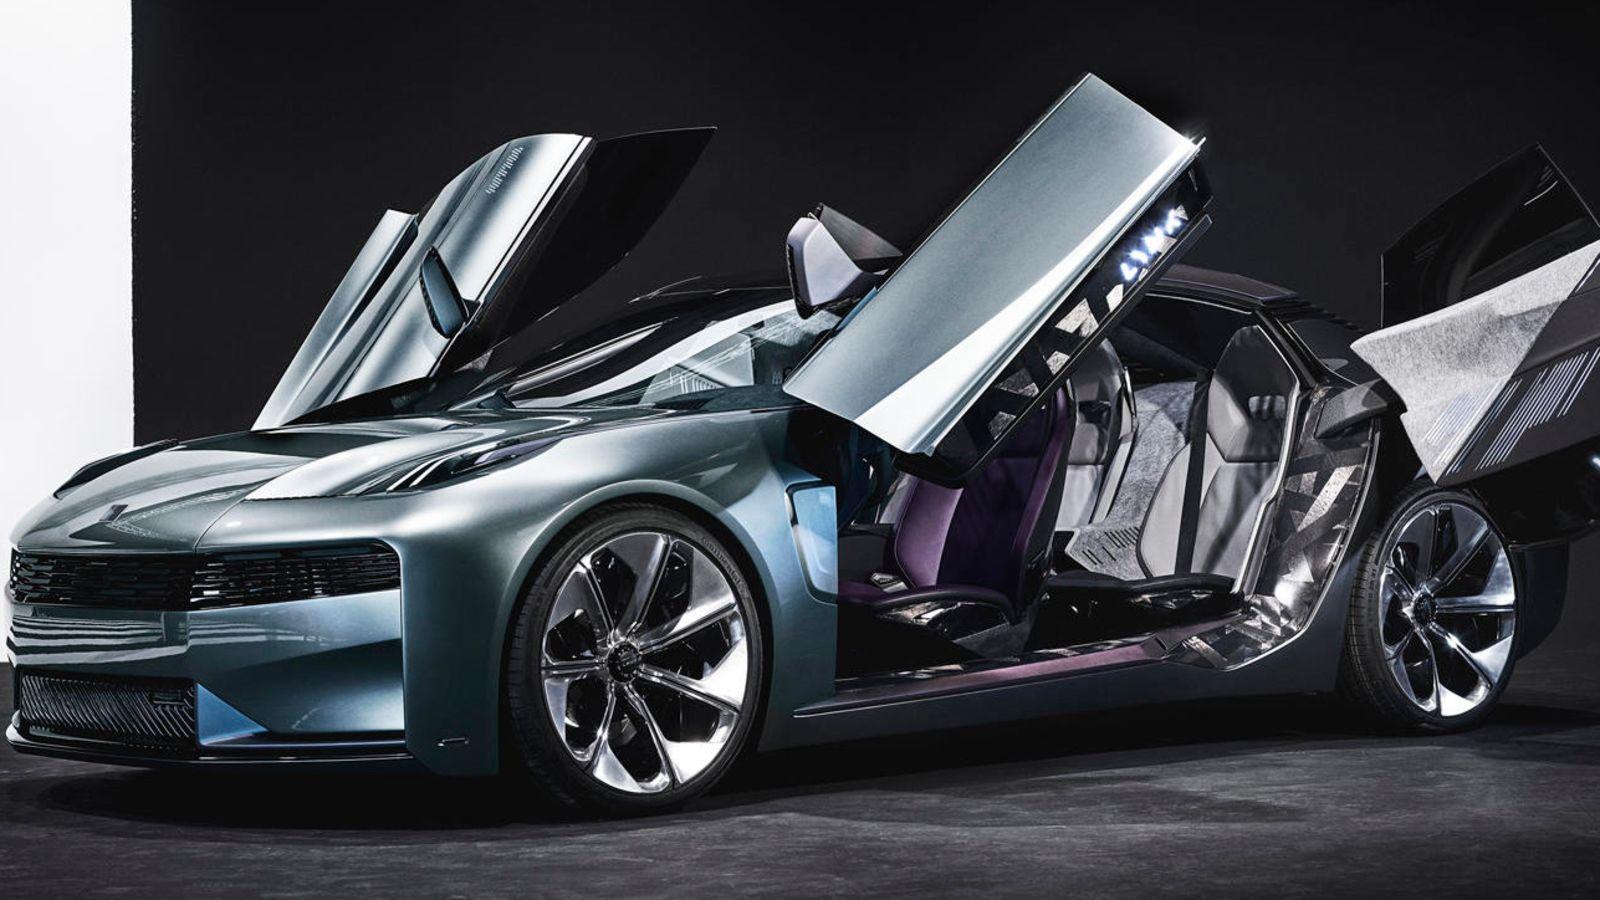 Lynk Co S New Concept Sedan Looks Kind Of Awesome Concept Cars Super Cars Sedan